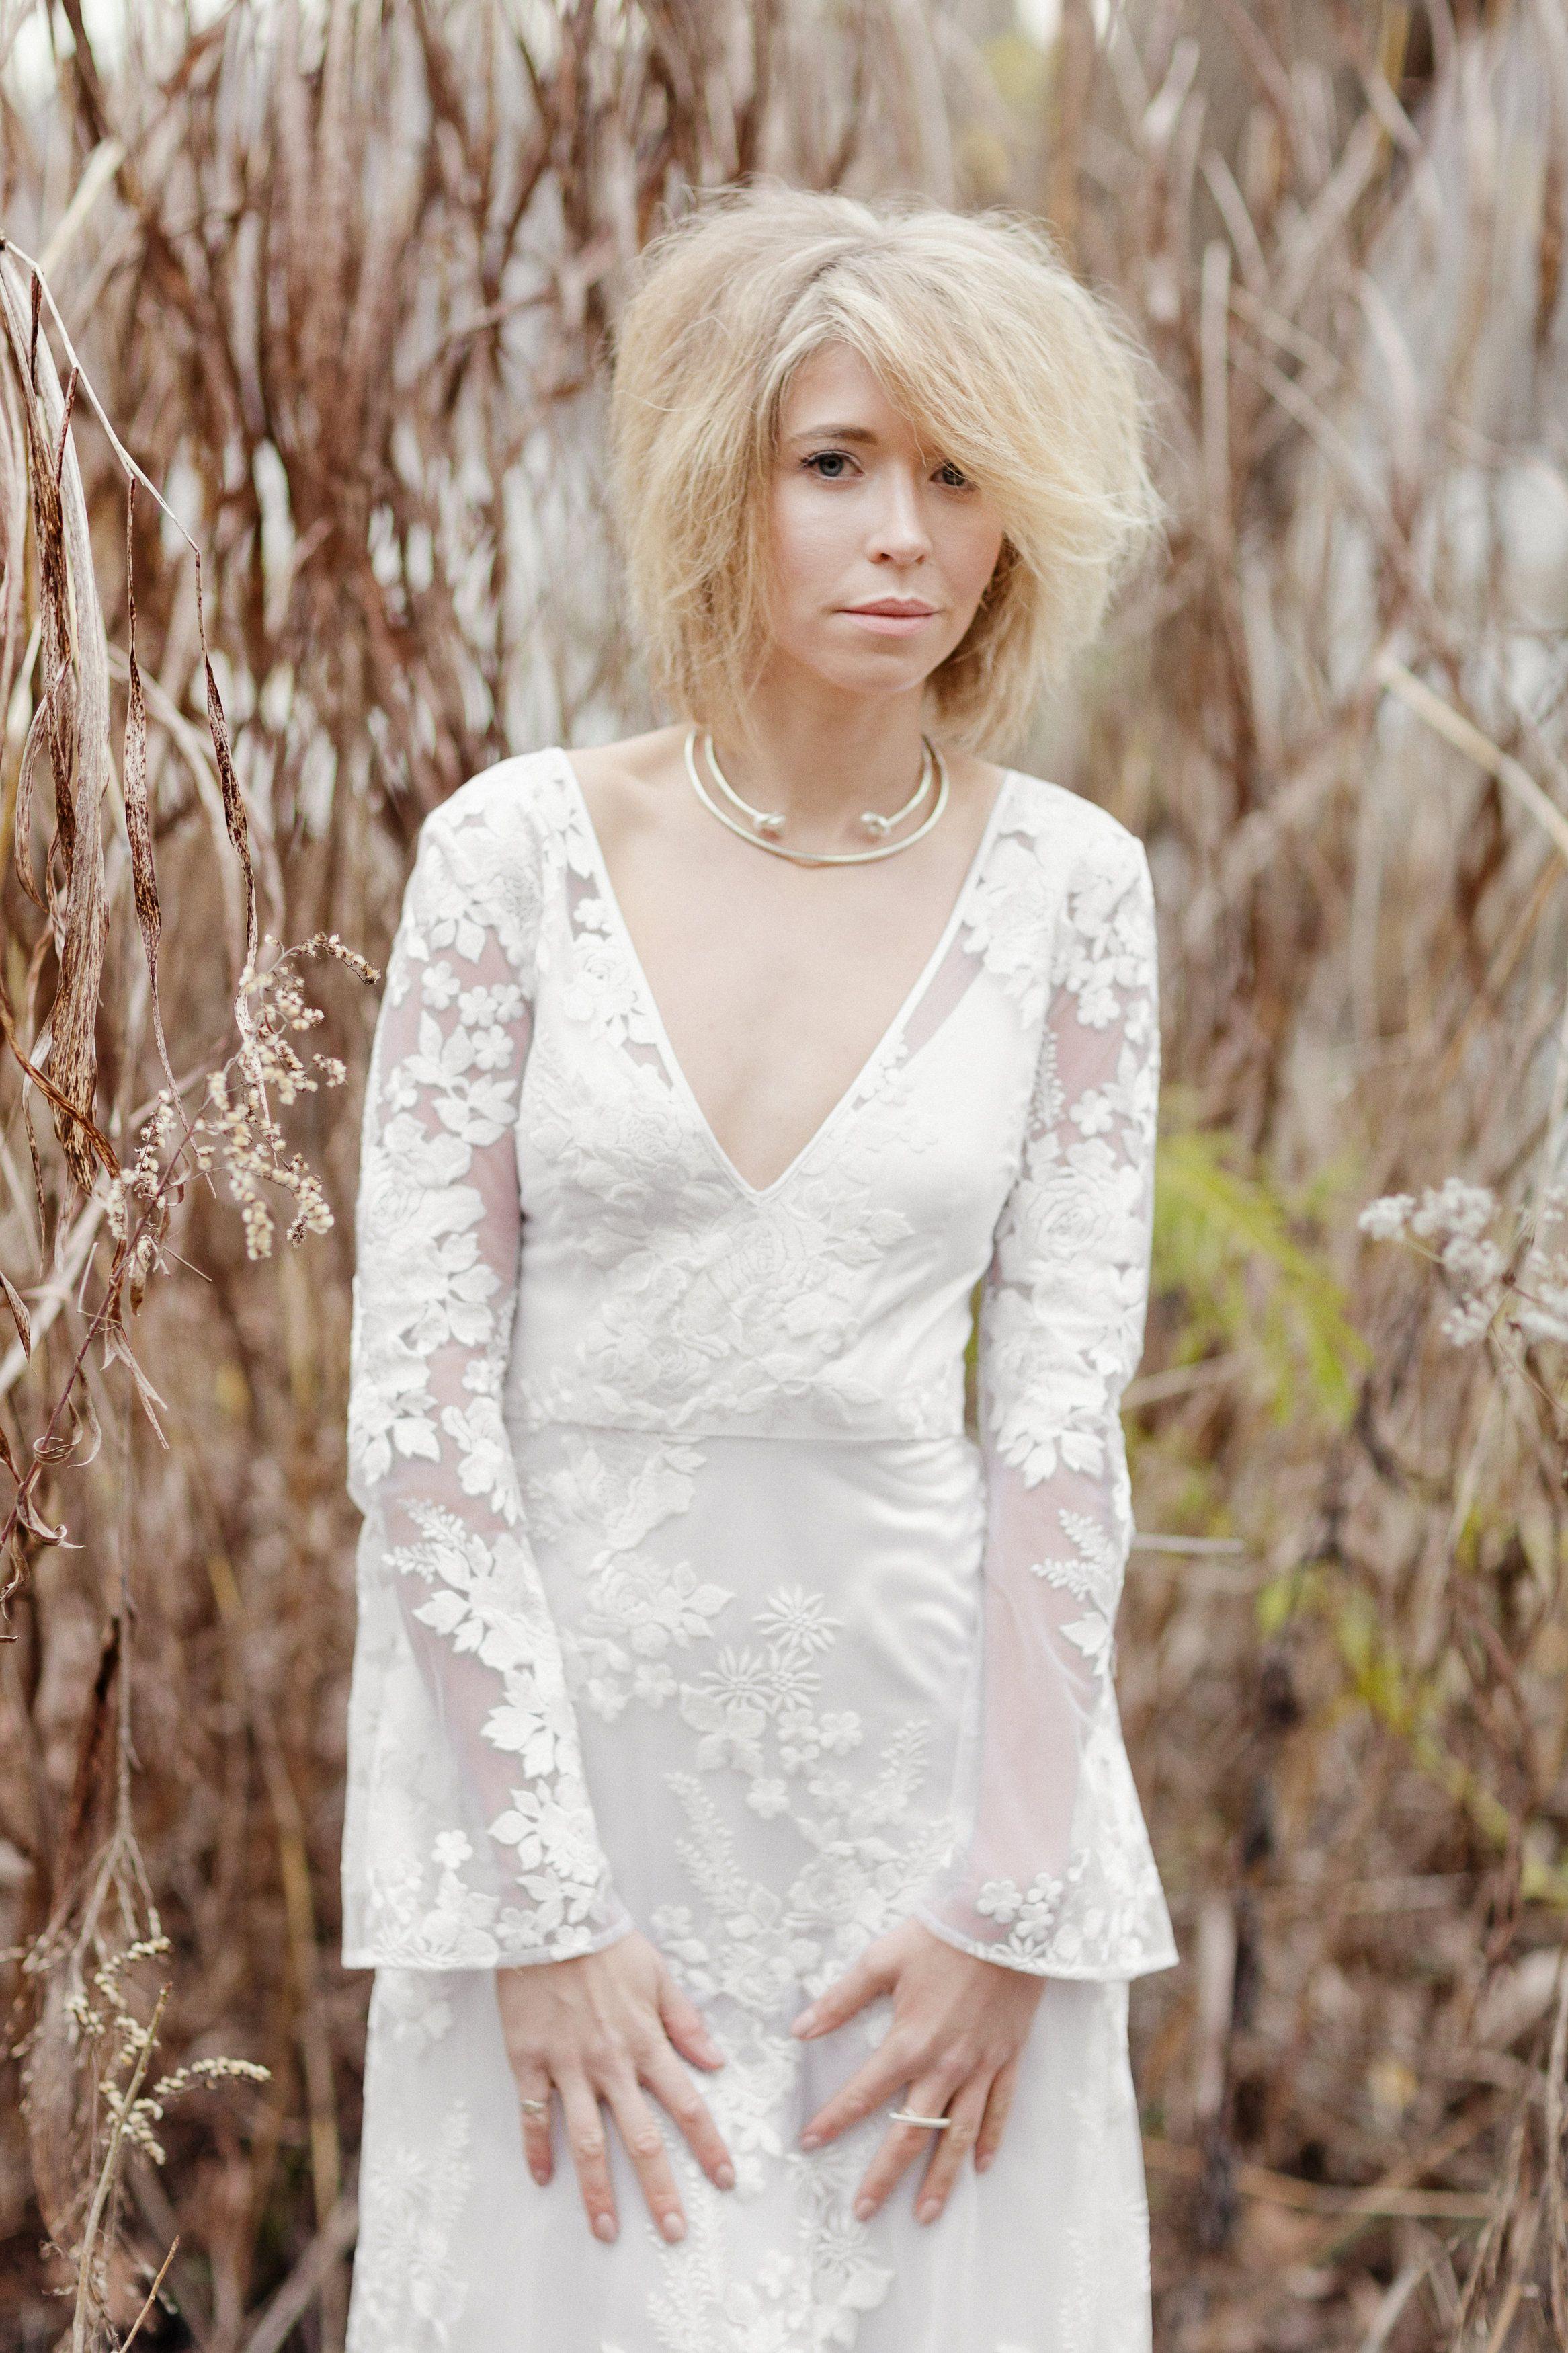 MARY OTANEZ PHOTOSHOOT Richmond, Virginia Winter Bridal